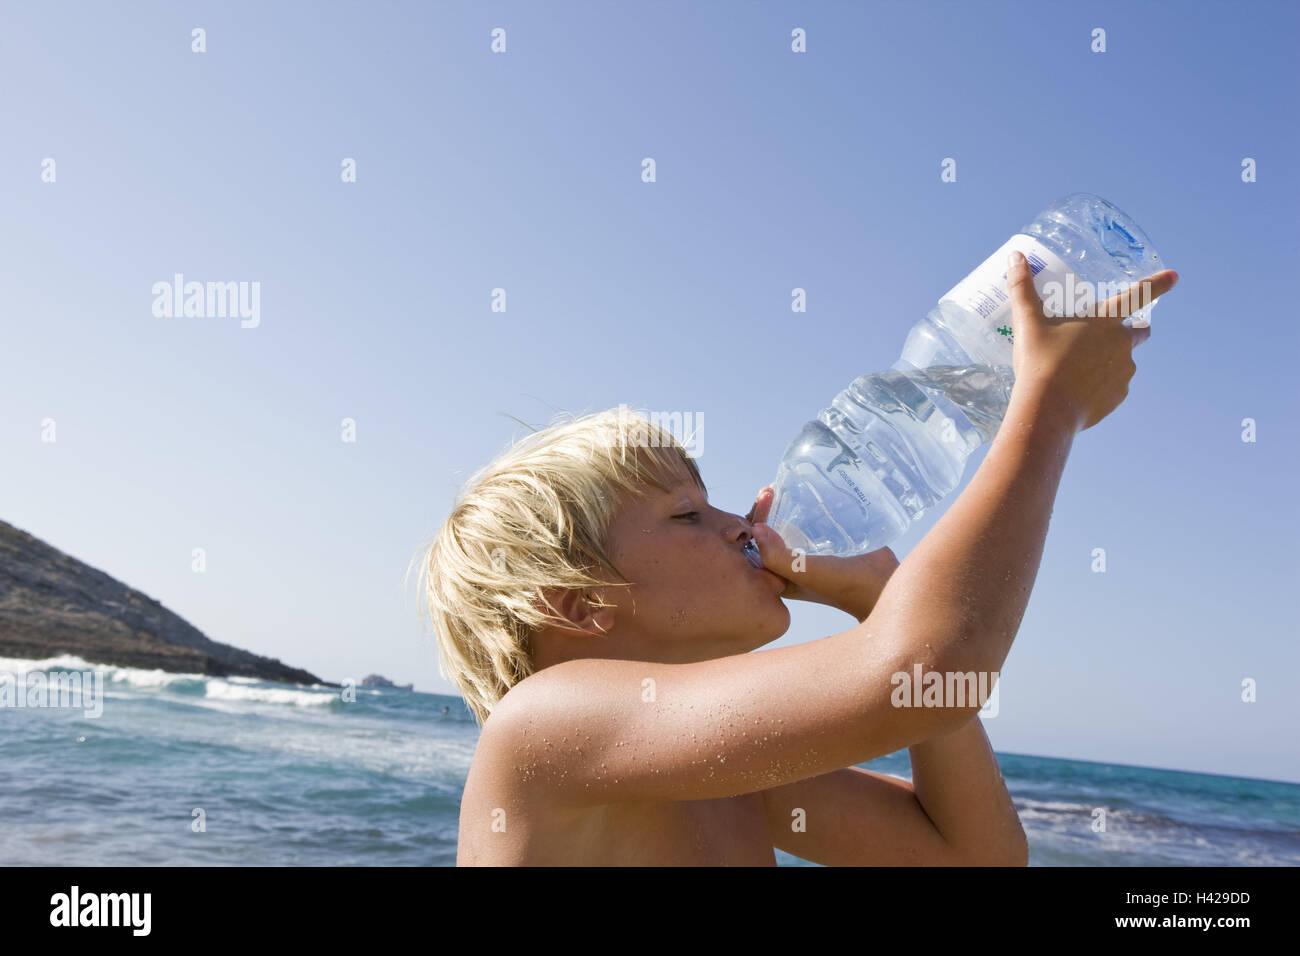 Beach, boy, thirsty, water bottle, drinking, portrait, side view, people, children, blond, summer holidays, holidays, - Stock Image